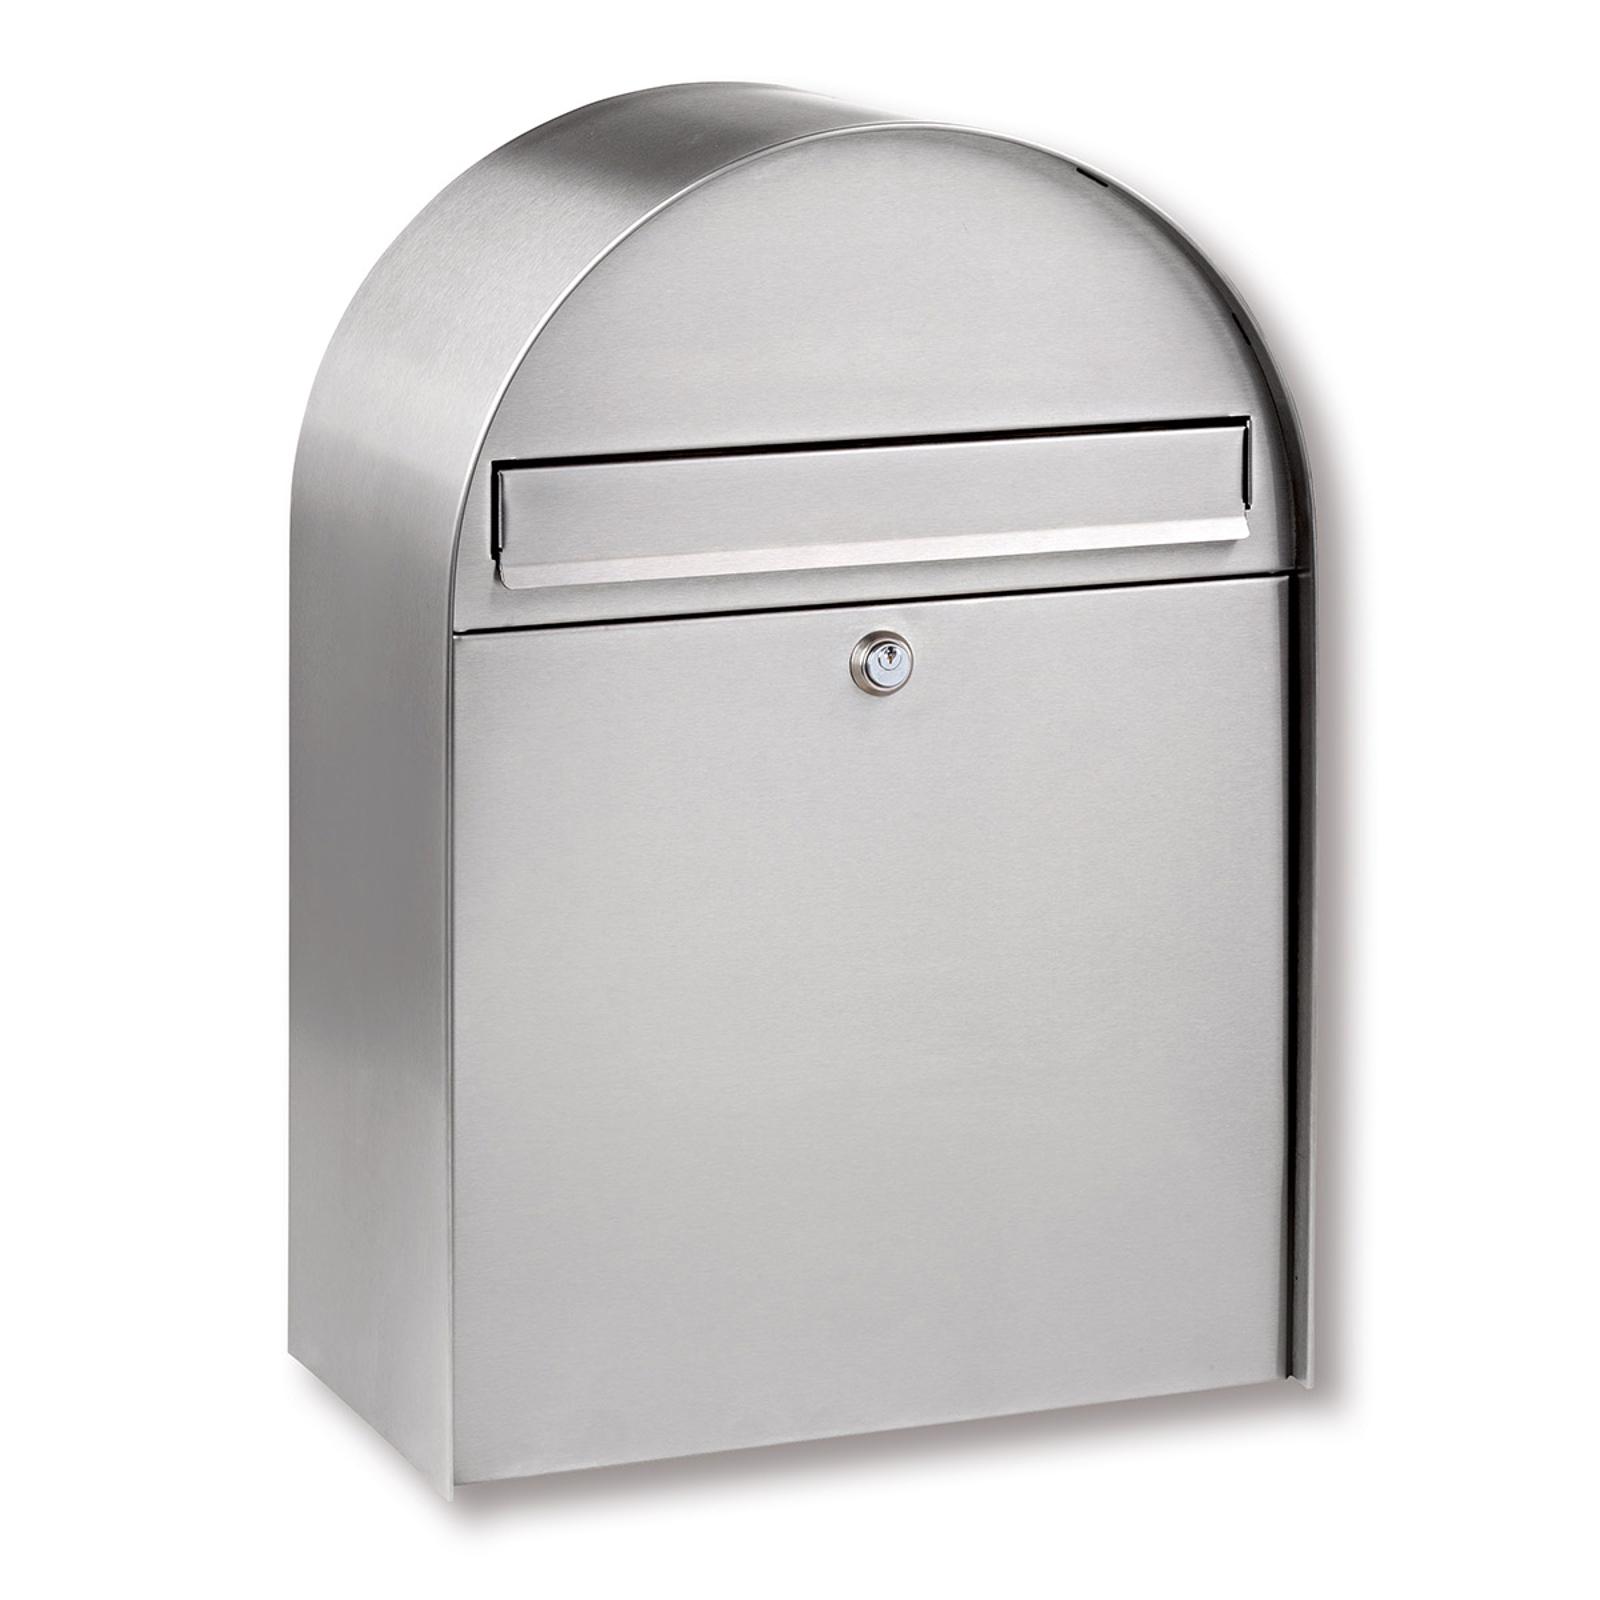 Poštová schránka ušľachtilá oceľ Nordic 3780 Ni